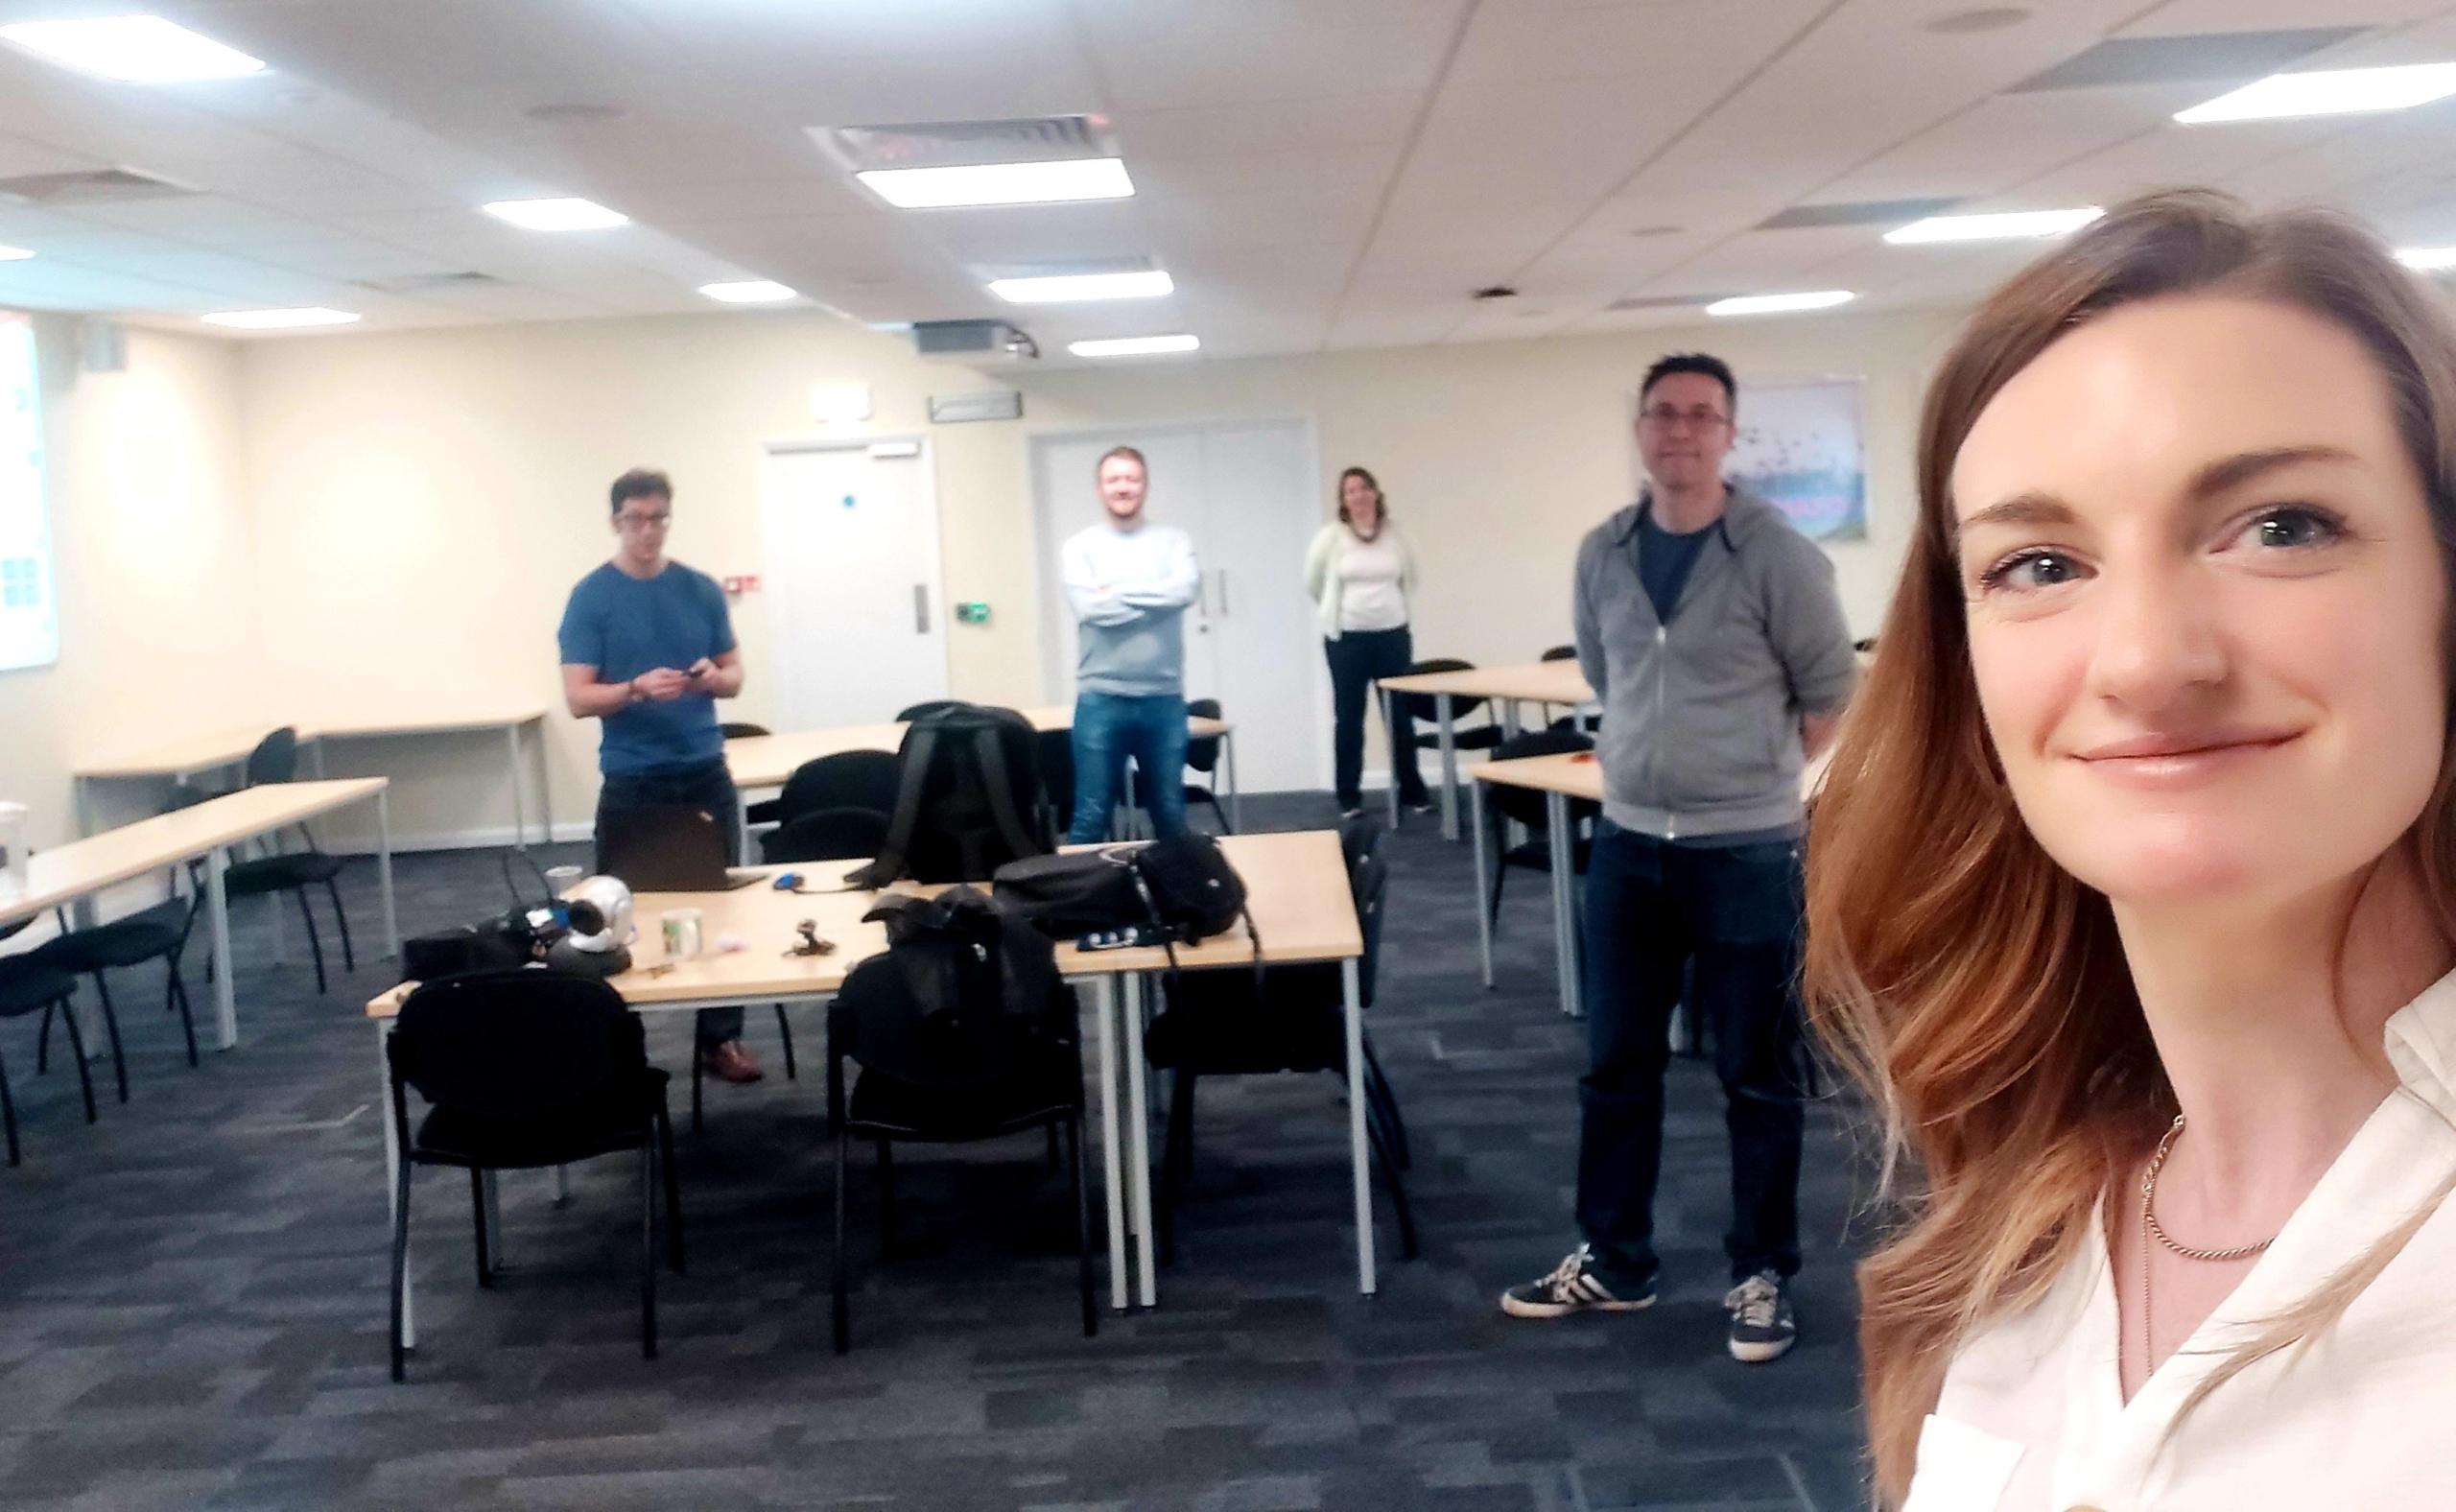 Cranfield's Digital Education Team